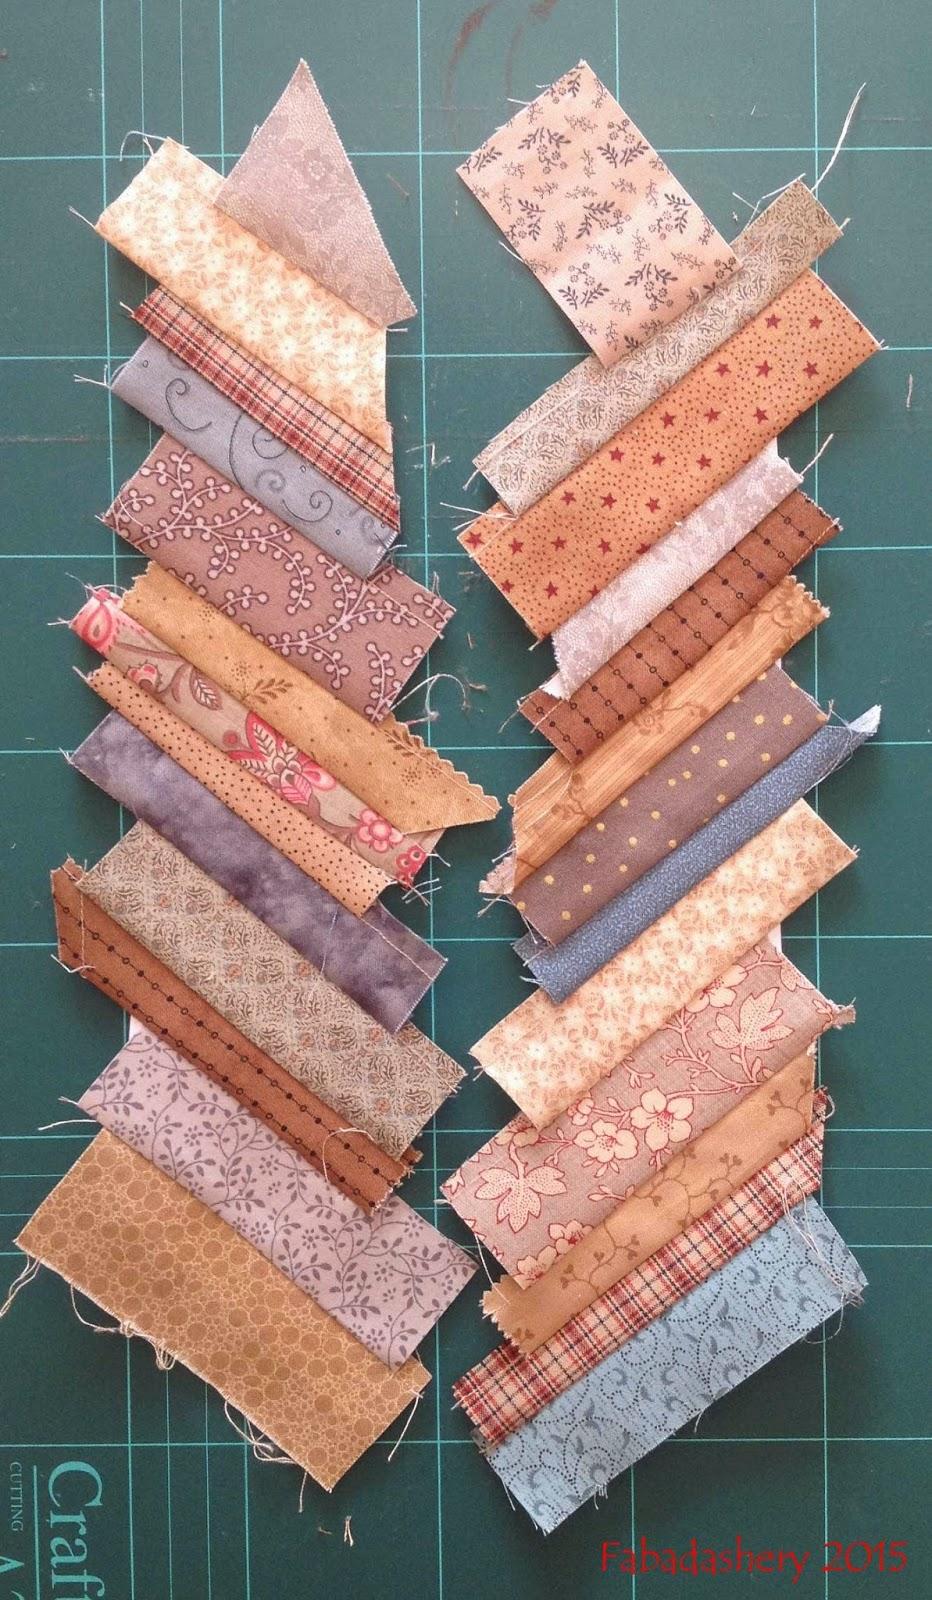 Foundation Piecing Scrap fabric